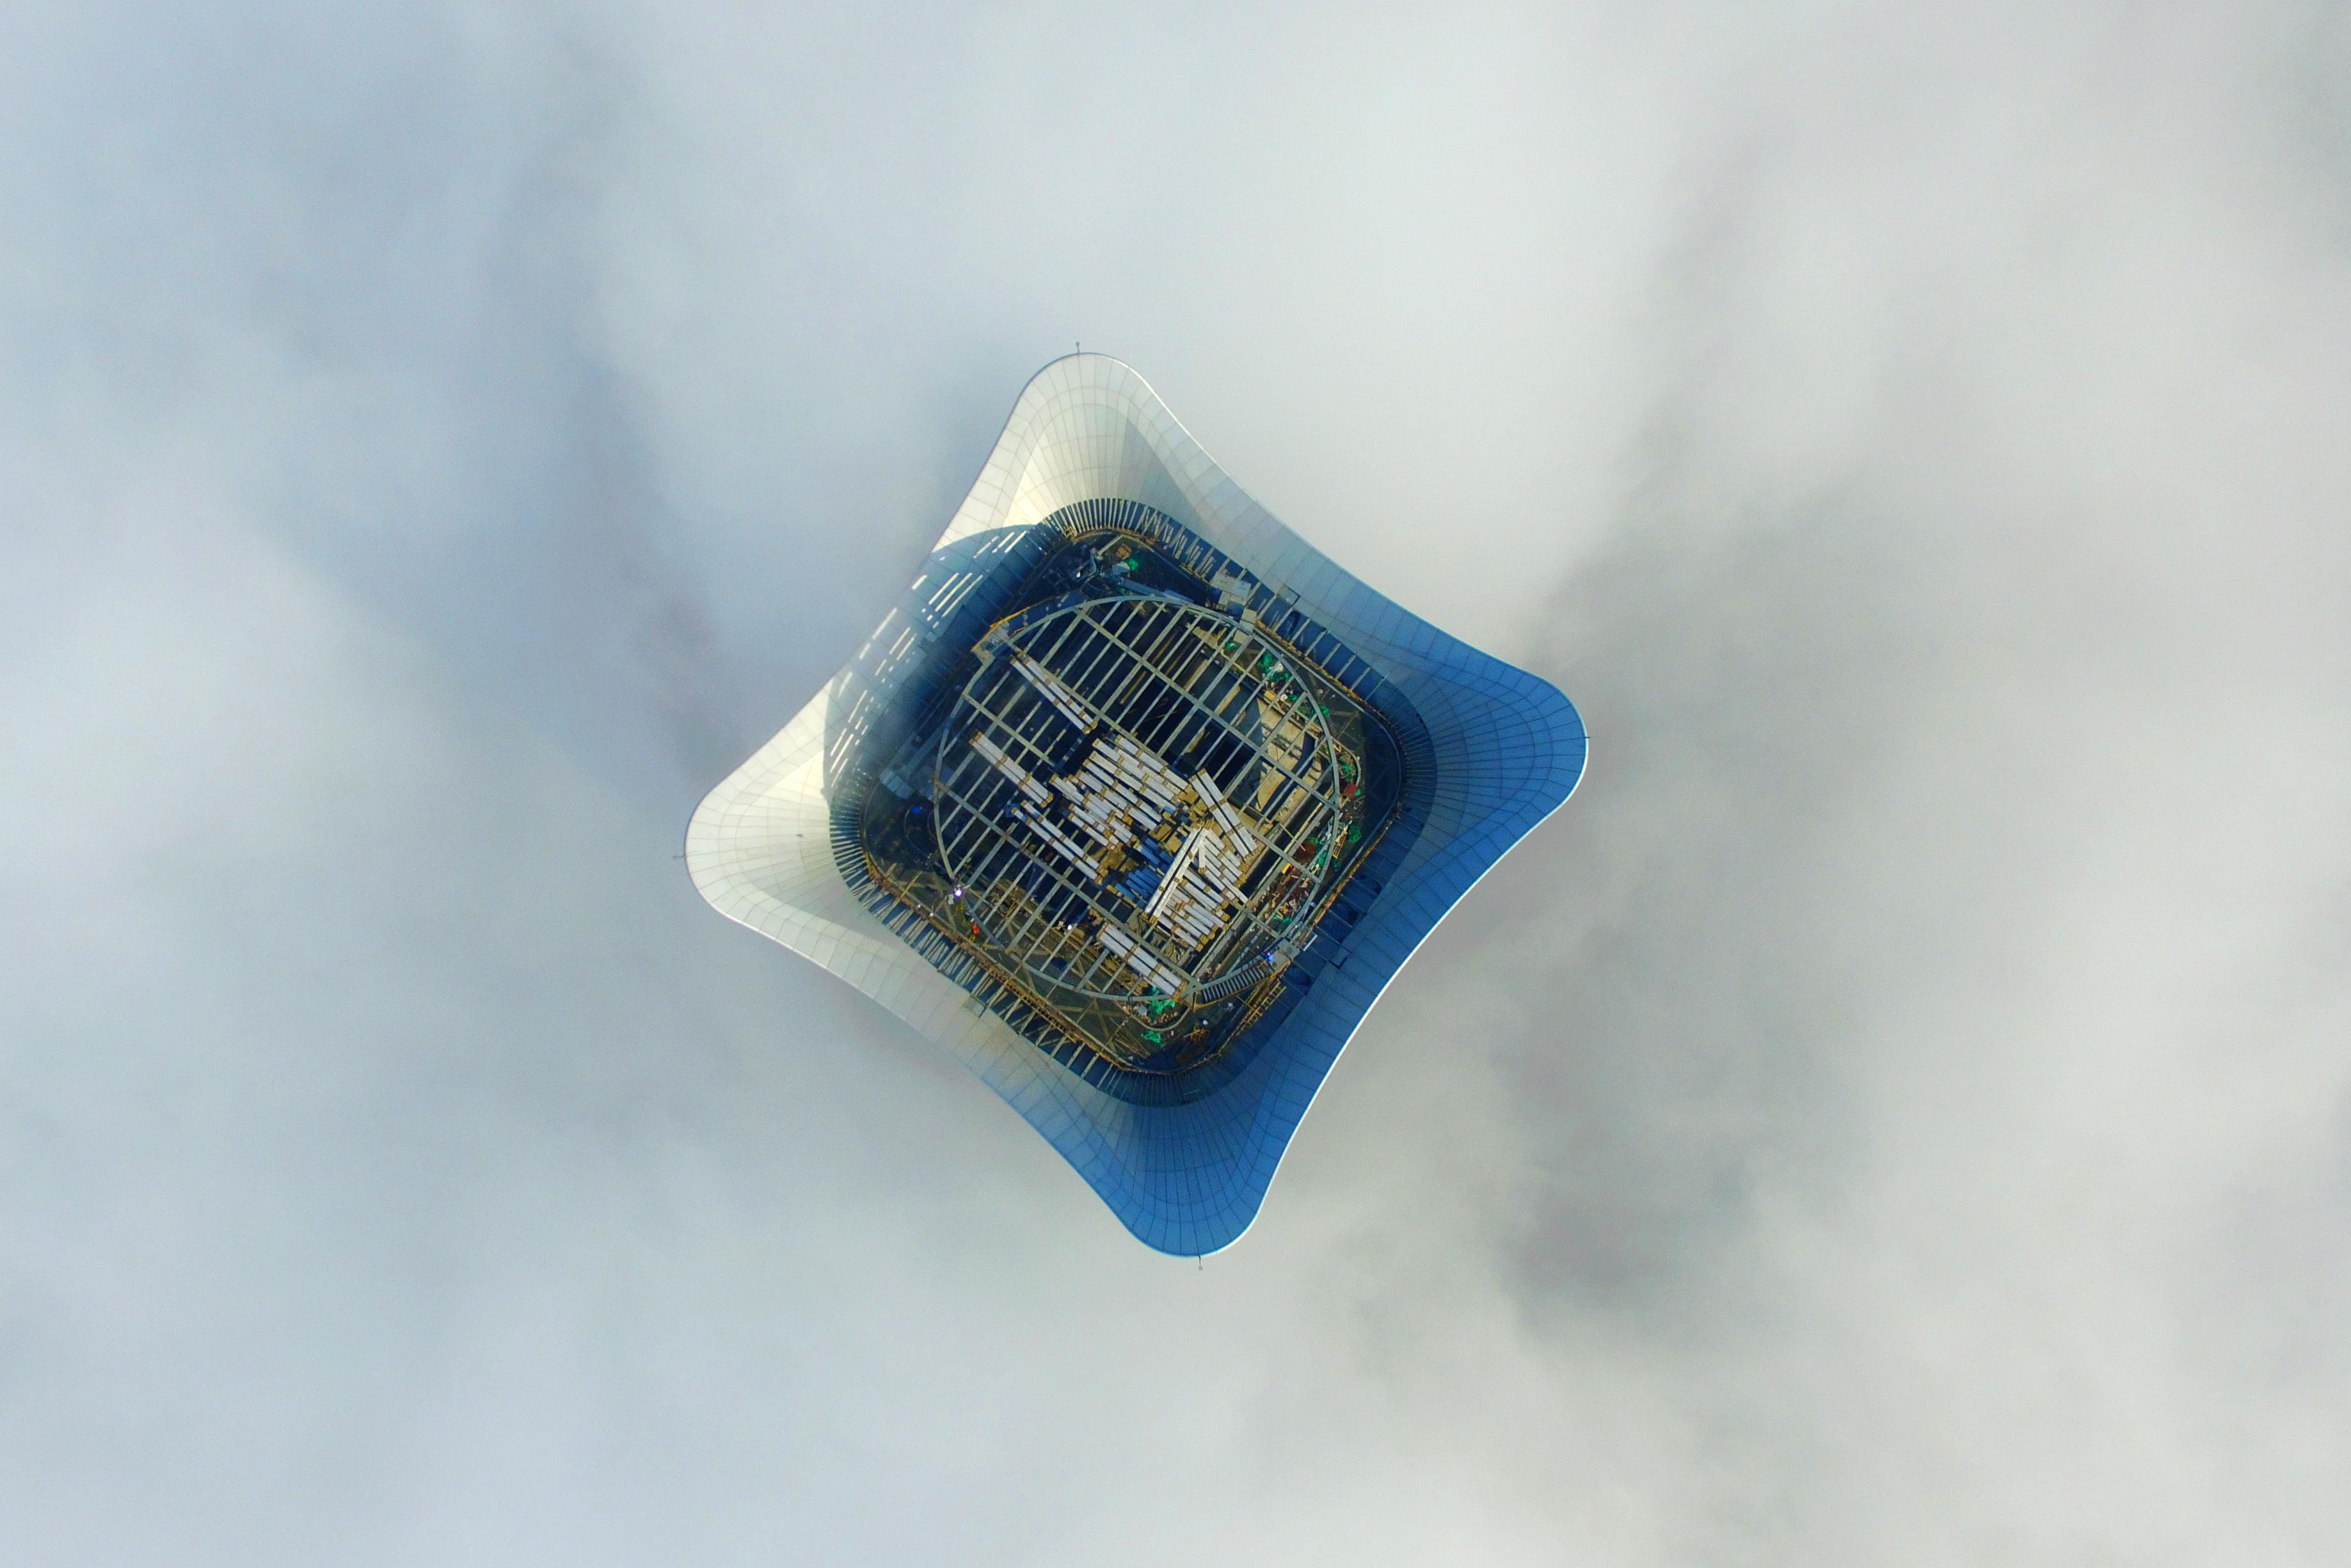 (160403) -- SHANGHAI, abril 3, 2016 (Xinhua) -- Imagen del 1 de abril de 2016 de la vista aérea de la Plaza Baiyulan rodeada de niebla en Shanghai, en el este de China. Shanghai emitió una alerta naranja por niebla el viernes. (Xinhua/Cheng Xugang) (jp) (fnc)